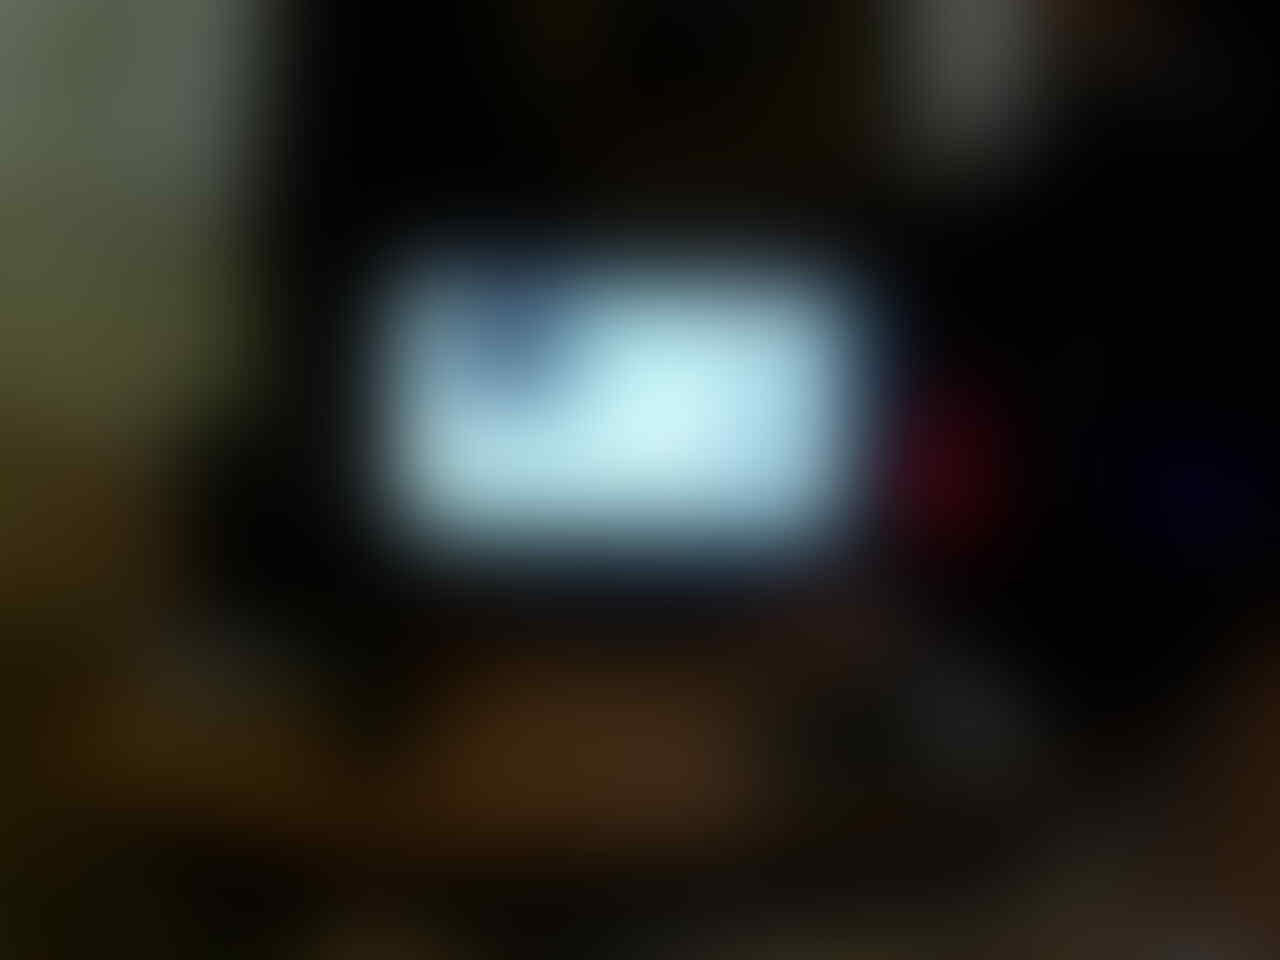 Promo Harga B Pro Alpha 5 Update 2018 Brica Pro5 Edition Mark Iis 4k Komplit Ae2s 2s Ae 2 Ngumpul Dan Sharing Pengguna Page 66